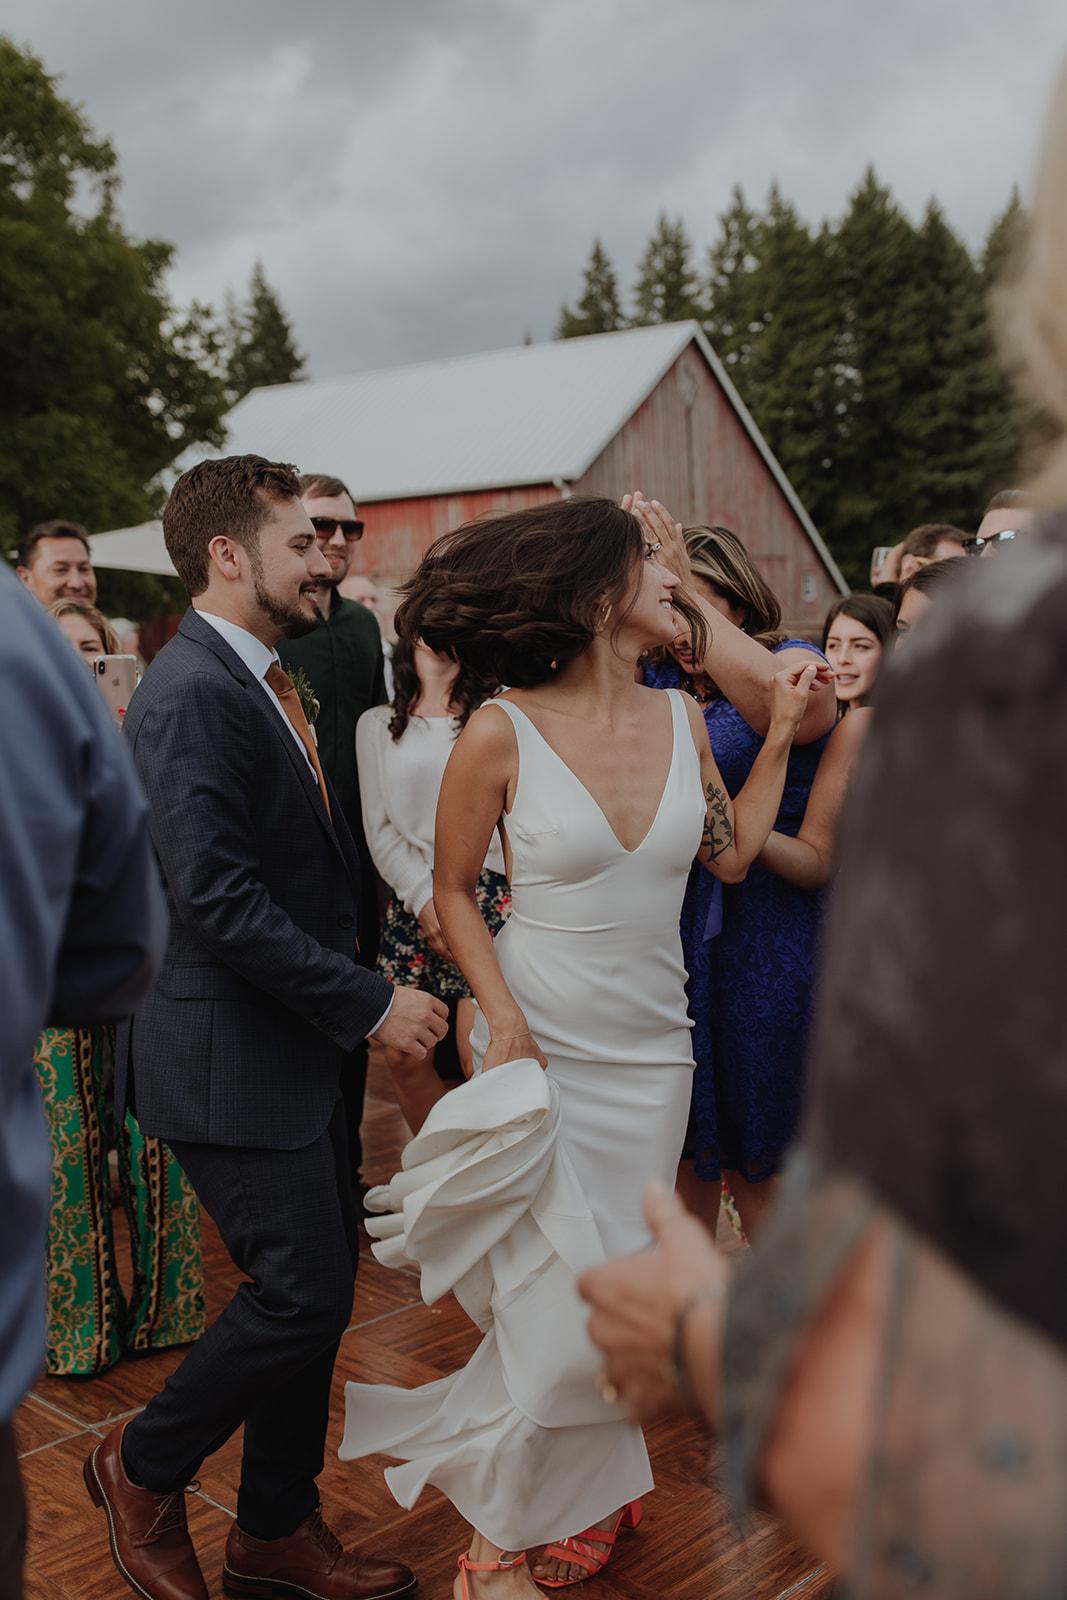 cortney_skye_wedding_june2019-698.jpg